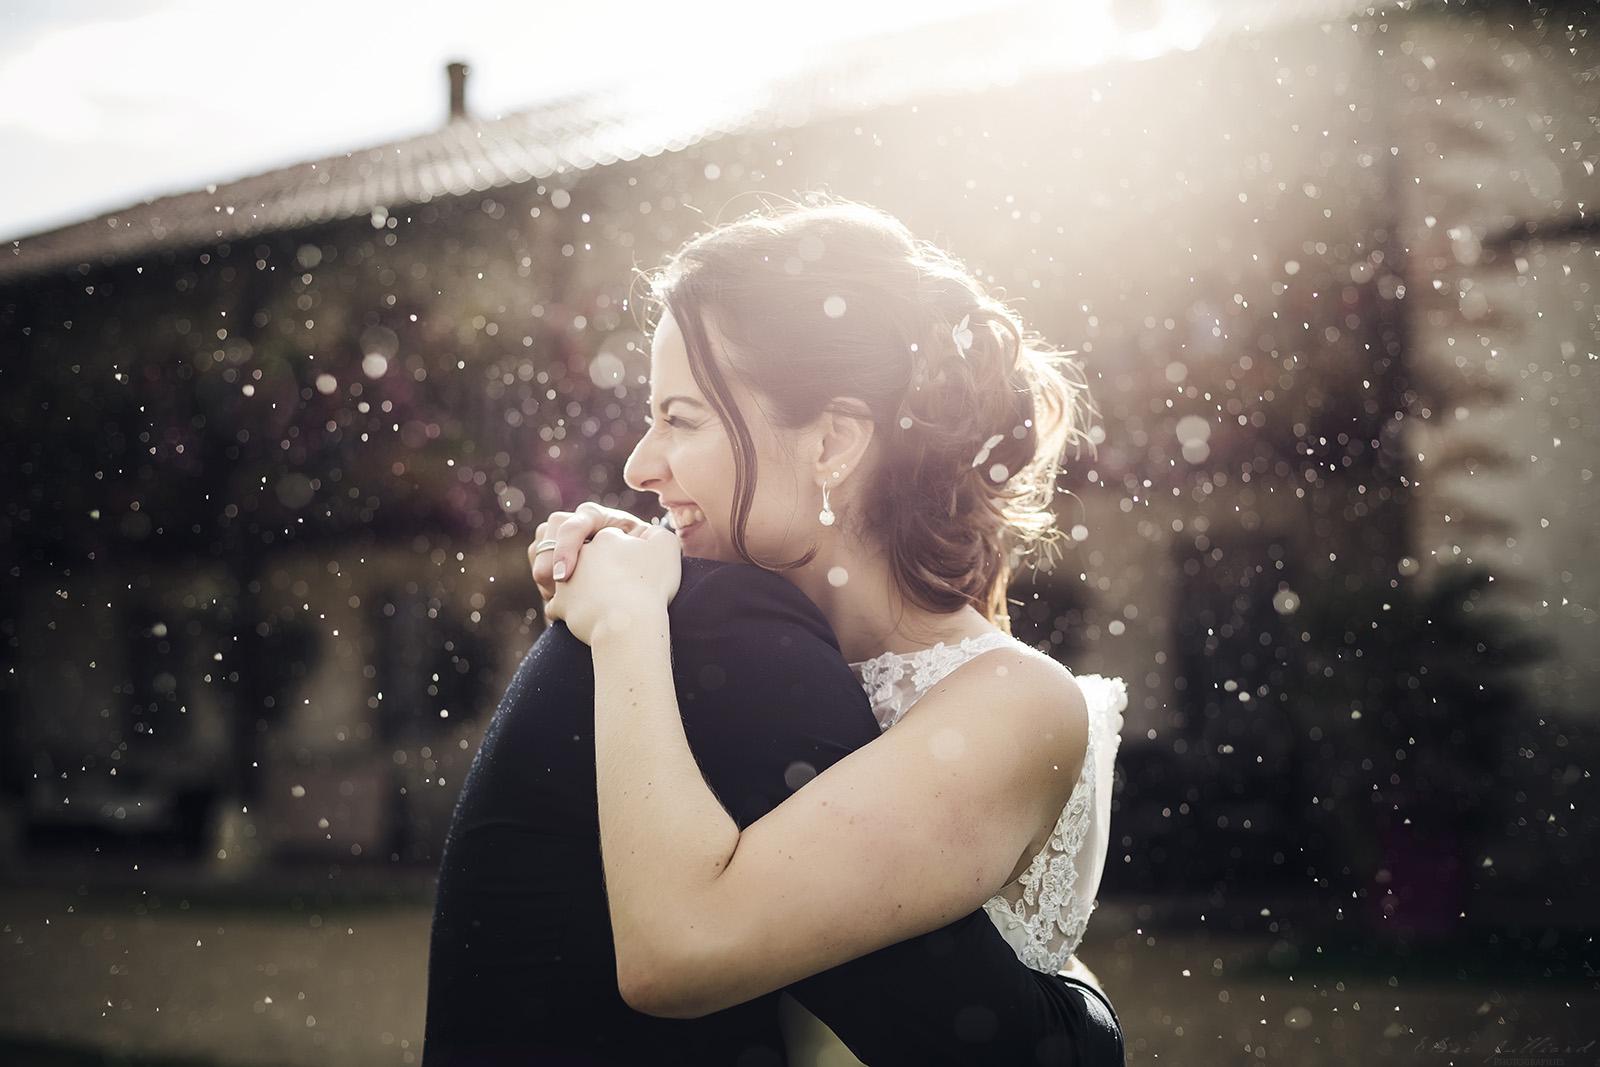 photo-reportage-mariage-bourg-en-bresse-ain-dombes-wedding-auvergne-rhone-alpes-seance-couple-love-session-elise-julliard-photographe-lyon-2